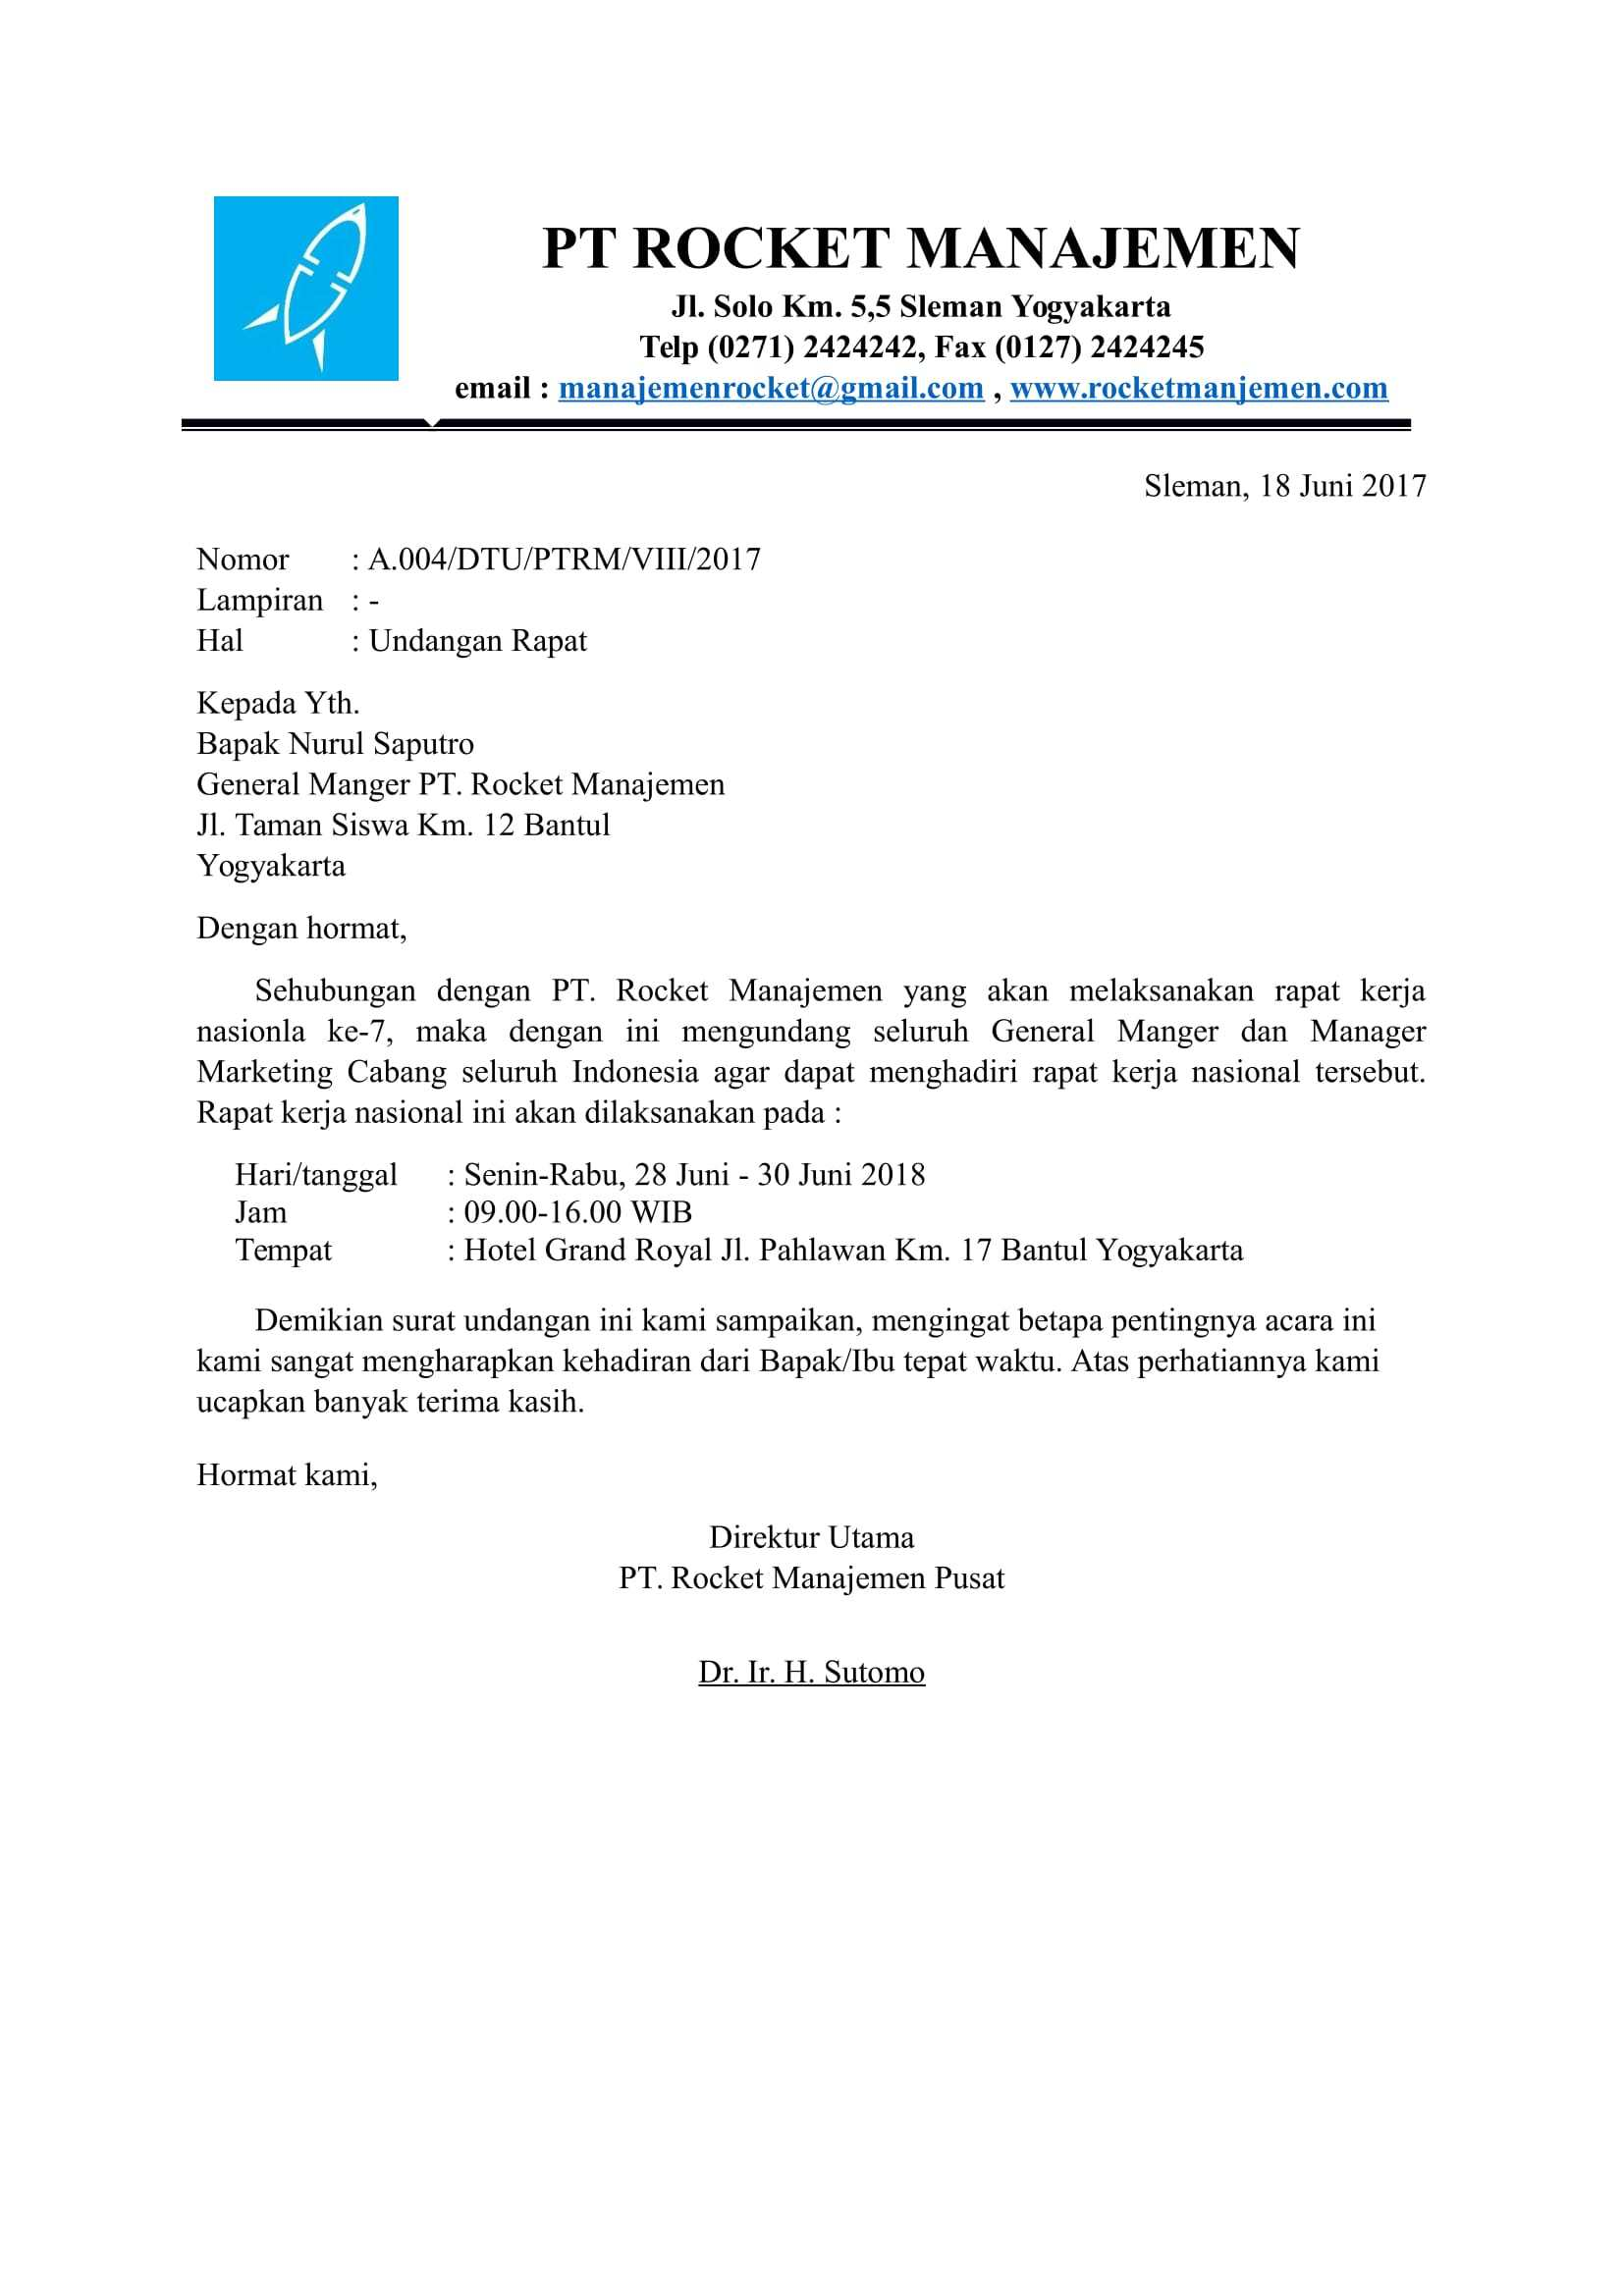 contoh surat undangan resmi perusahaan 2